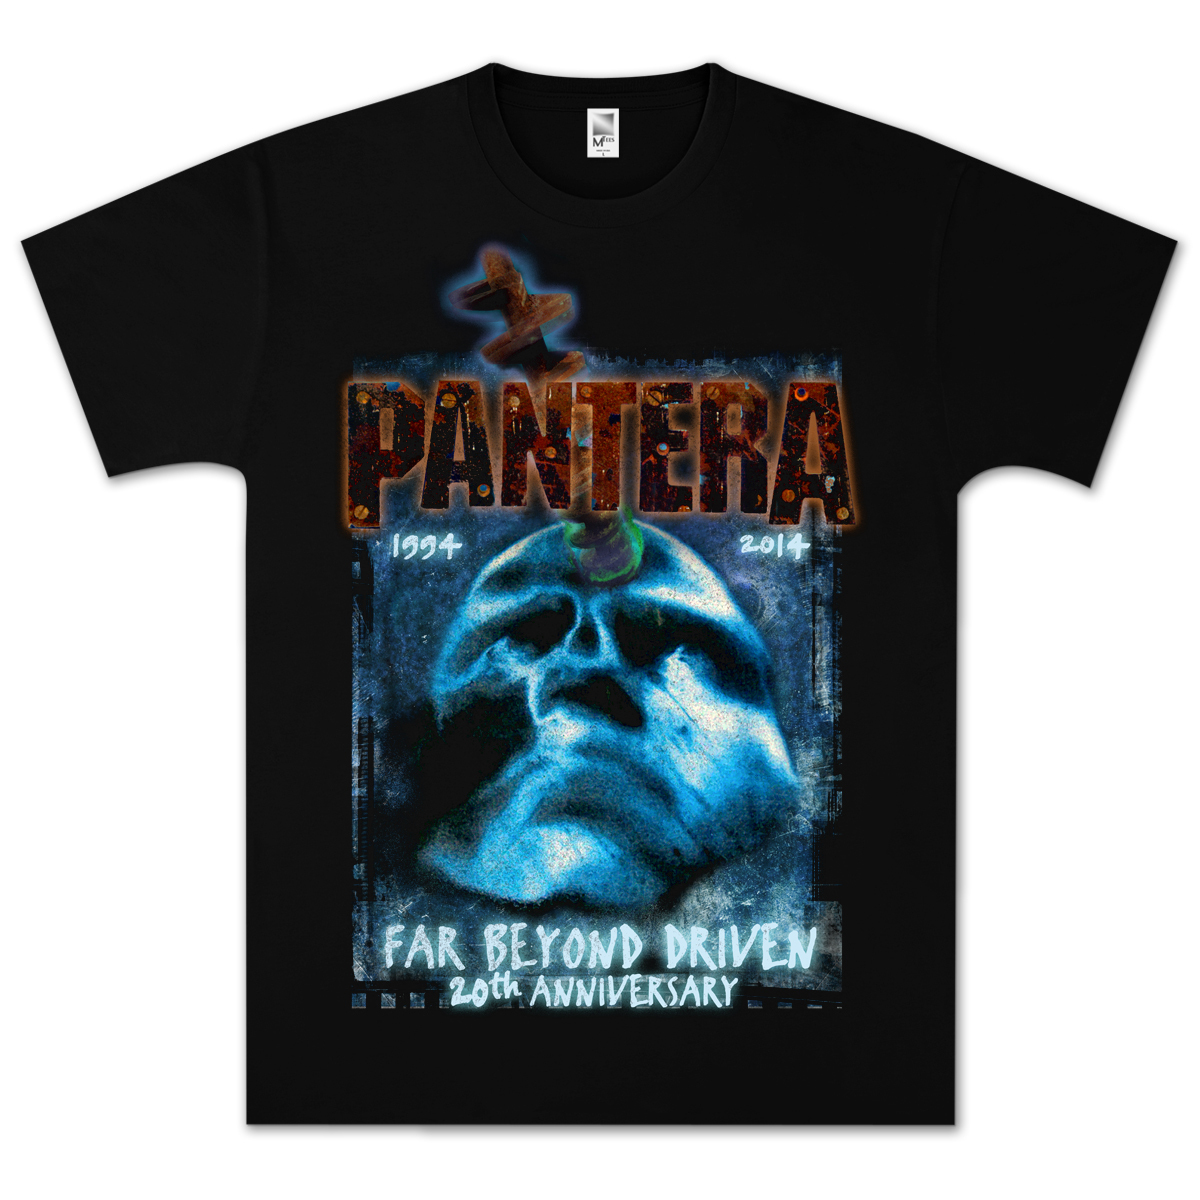 Pantera Far Beyond Driven 20th Anniversary T-Shirt